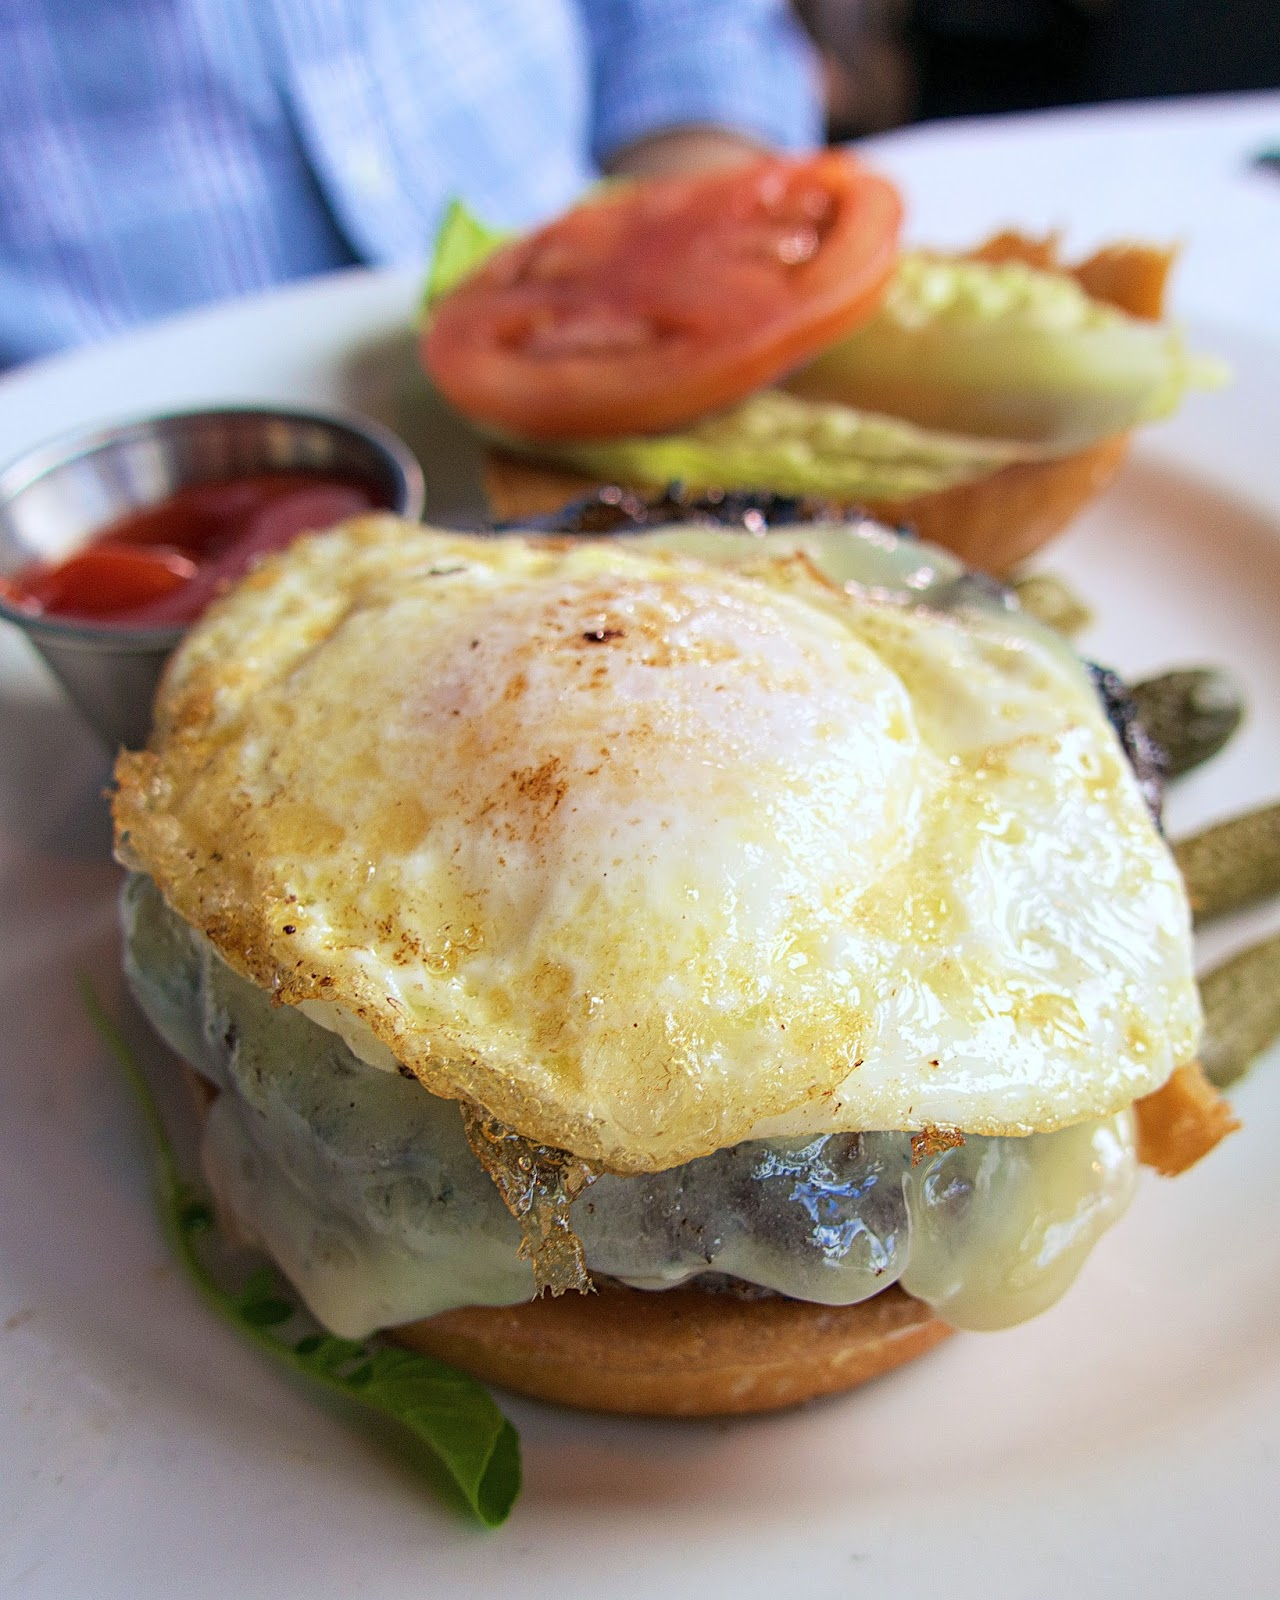 Mon Ami Gabi hamburger